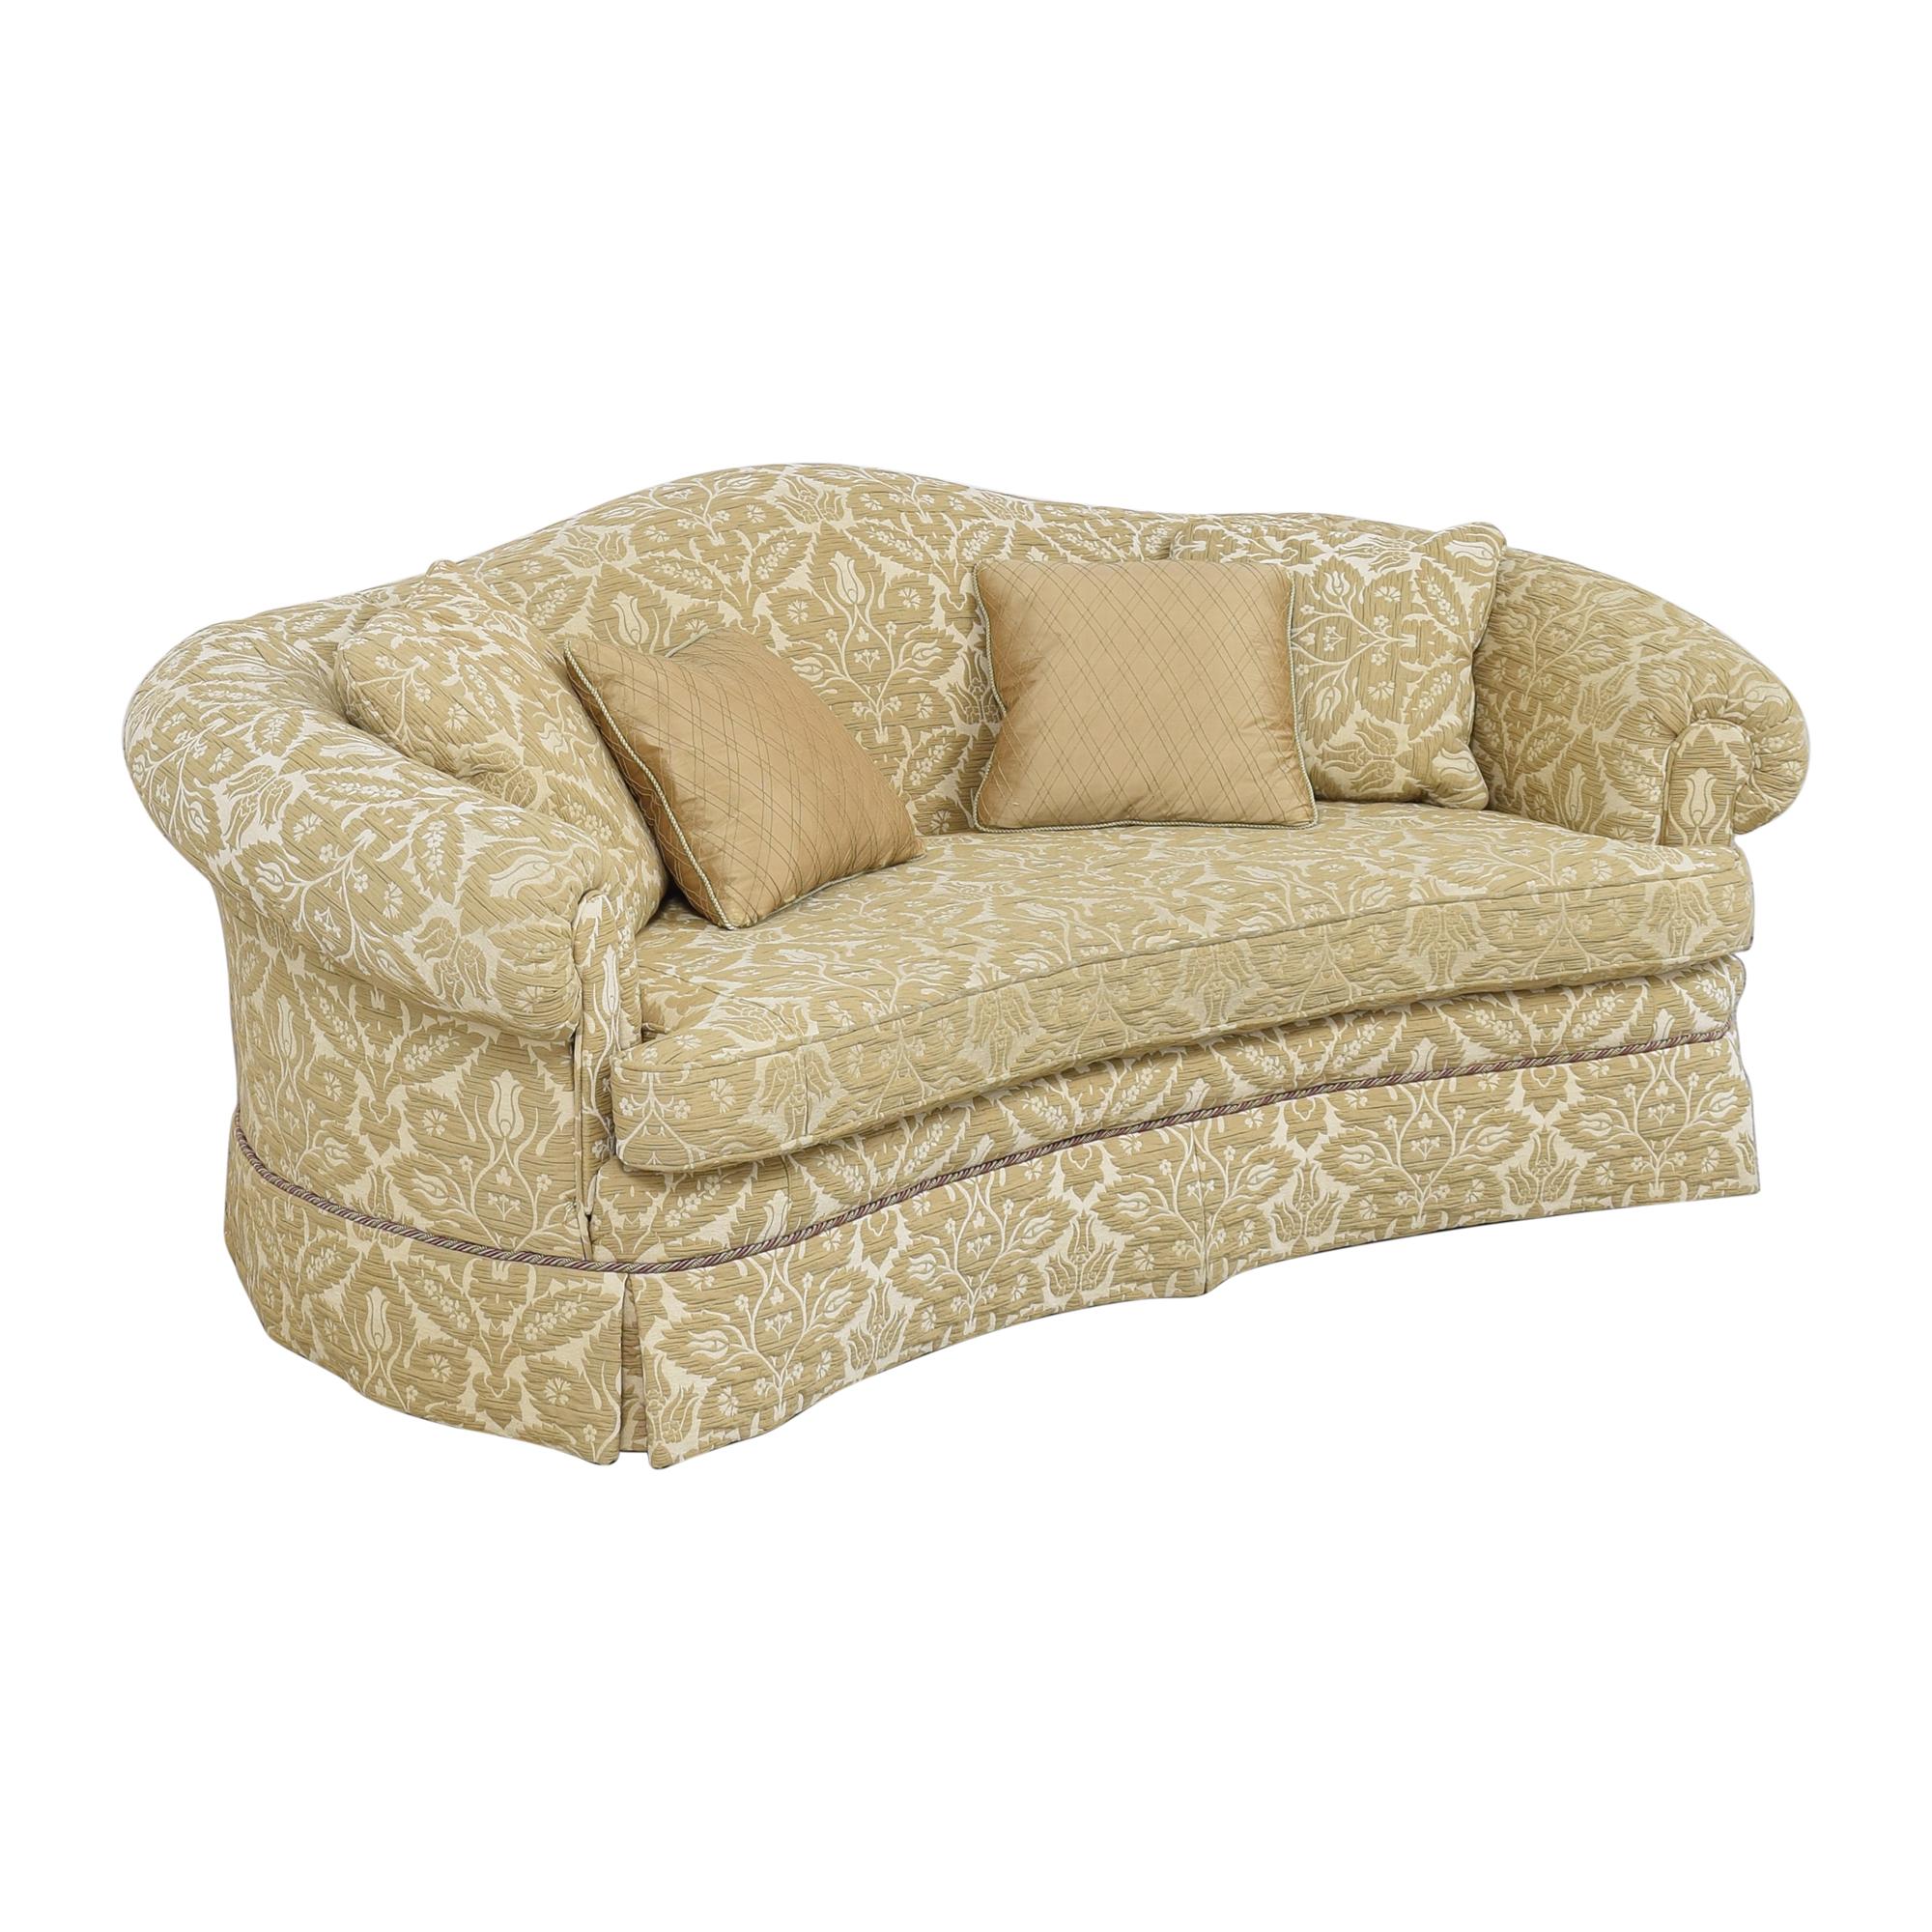 shop Sherrill Furniture Sherrill Furniture Curved Camel Back Sofa online